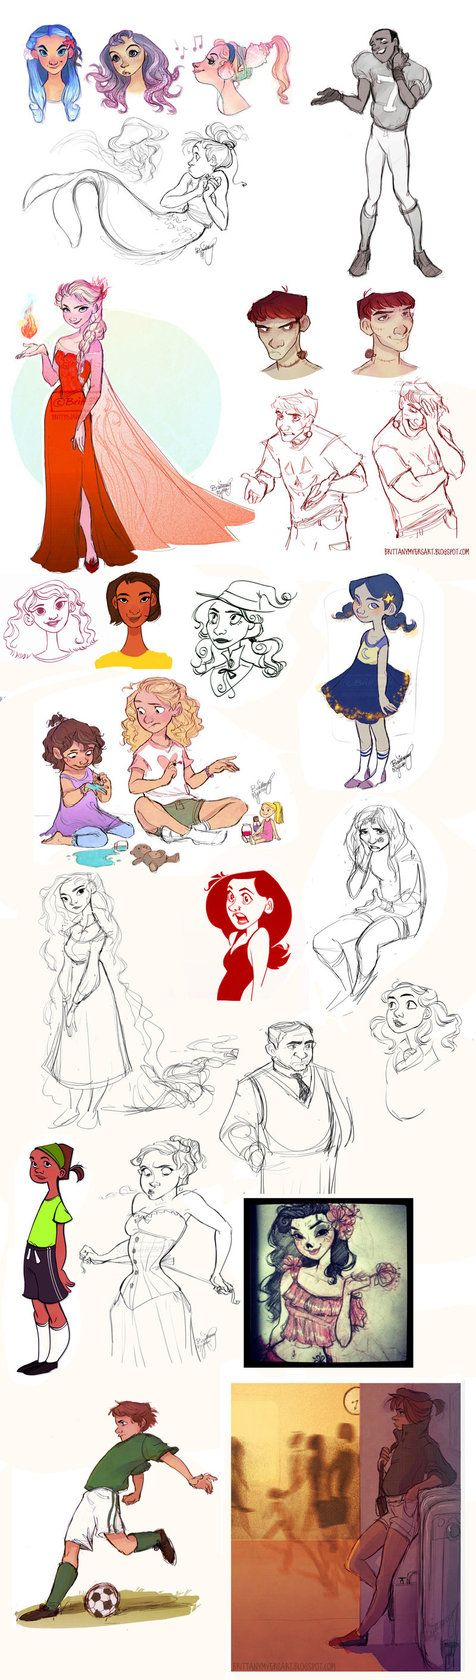 Oodles of Doodles 8 by Britt315 on deviantART